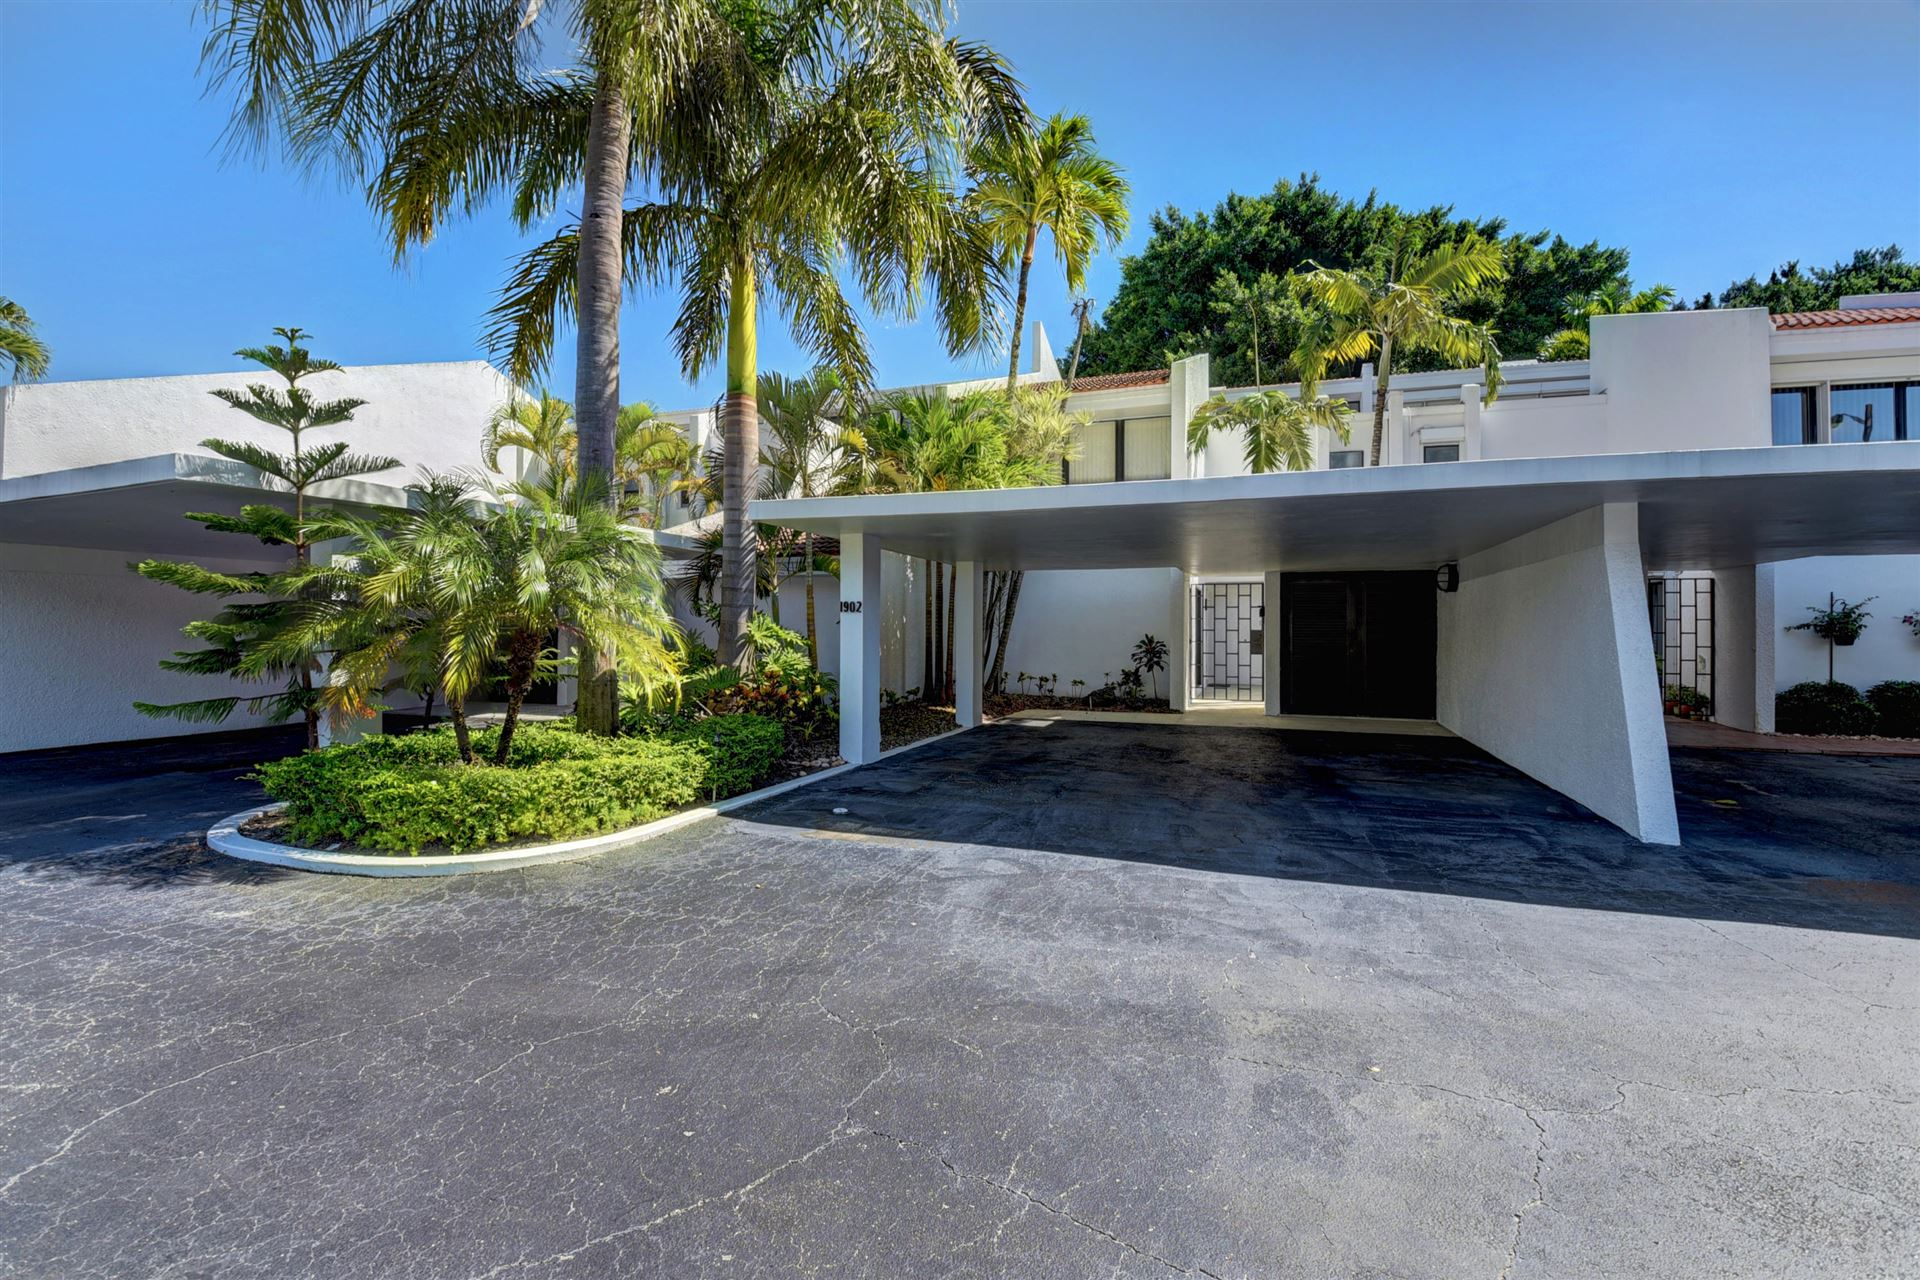 1902 Presidential Way #1-E, West Palm Beach, FL 33401 - #: RX-10667902